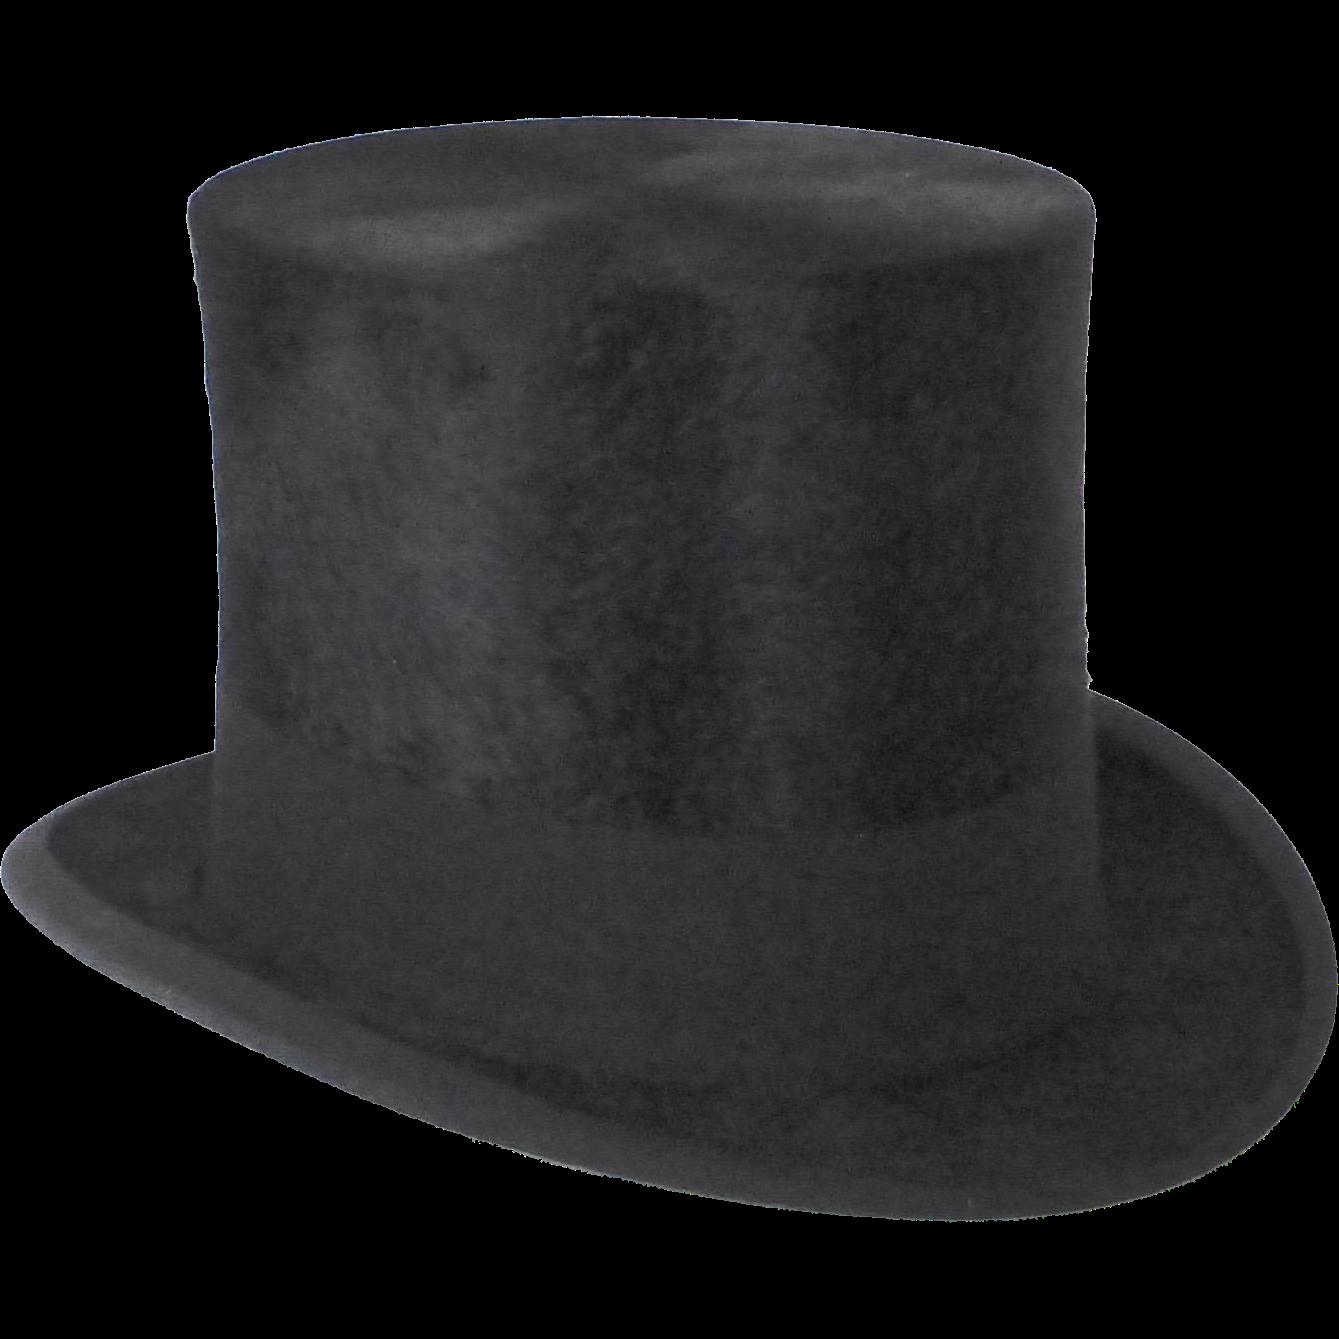 Antique Edwardian Black Beaver Top Hat & Box